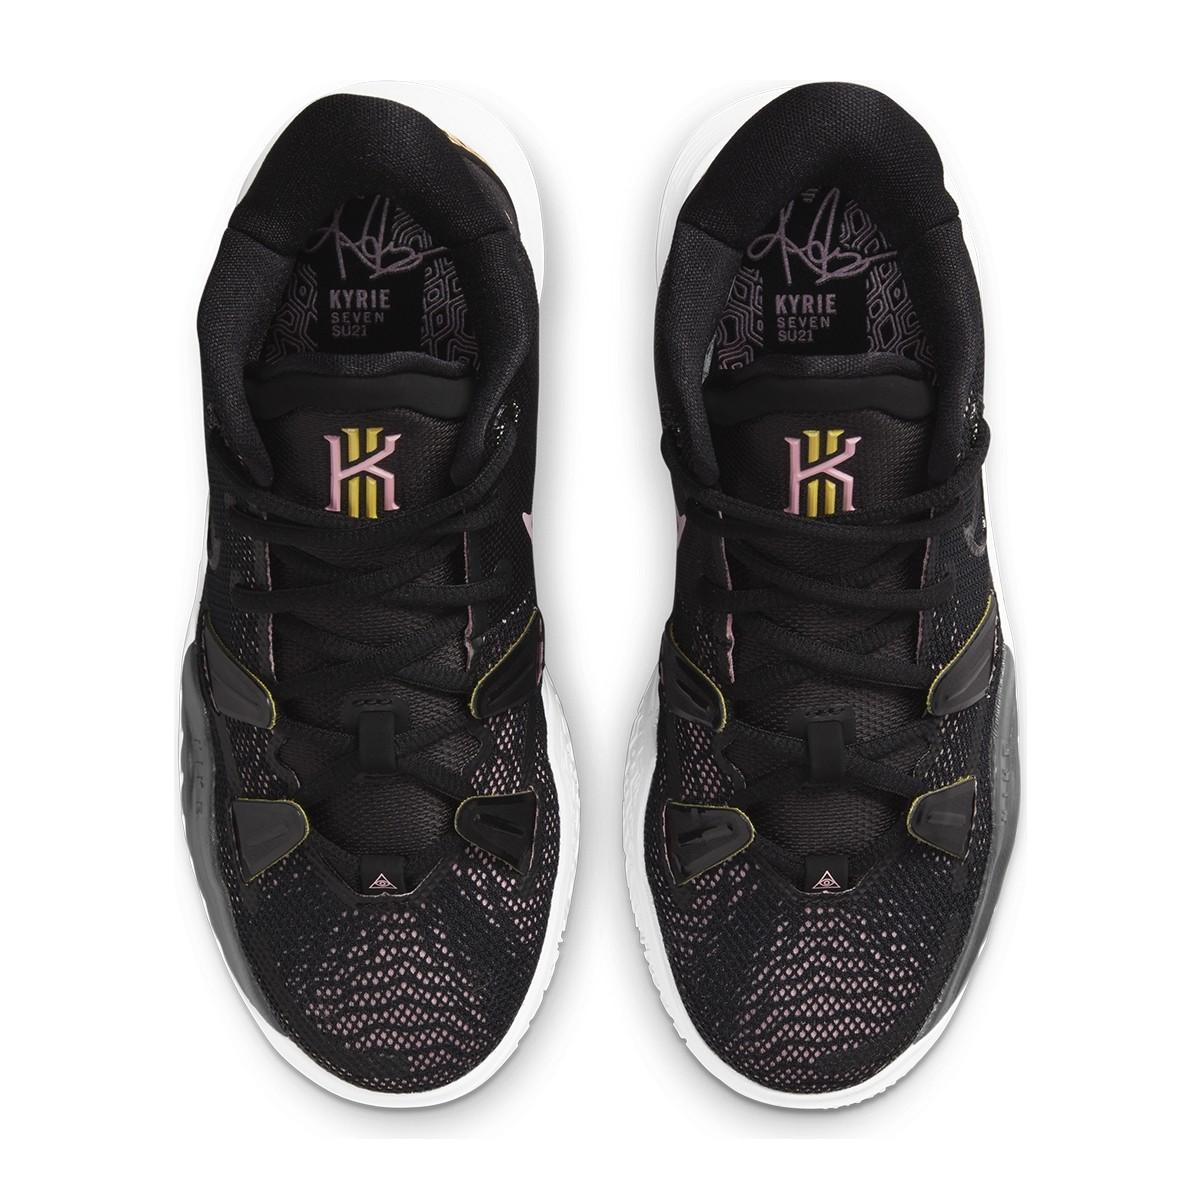 Nike Kyrie 7 Jr 'Ripple Effect'-CT4080-015